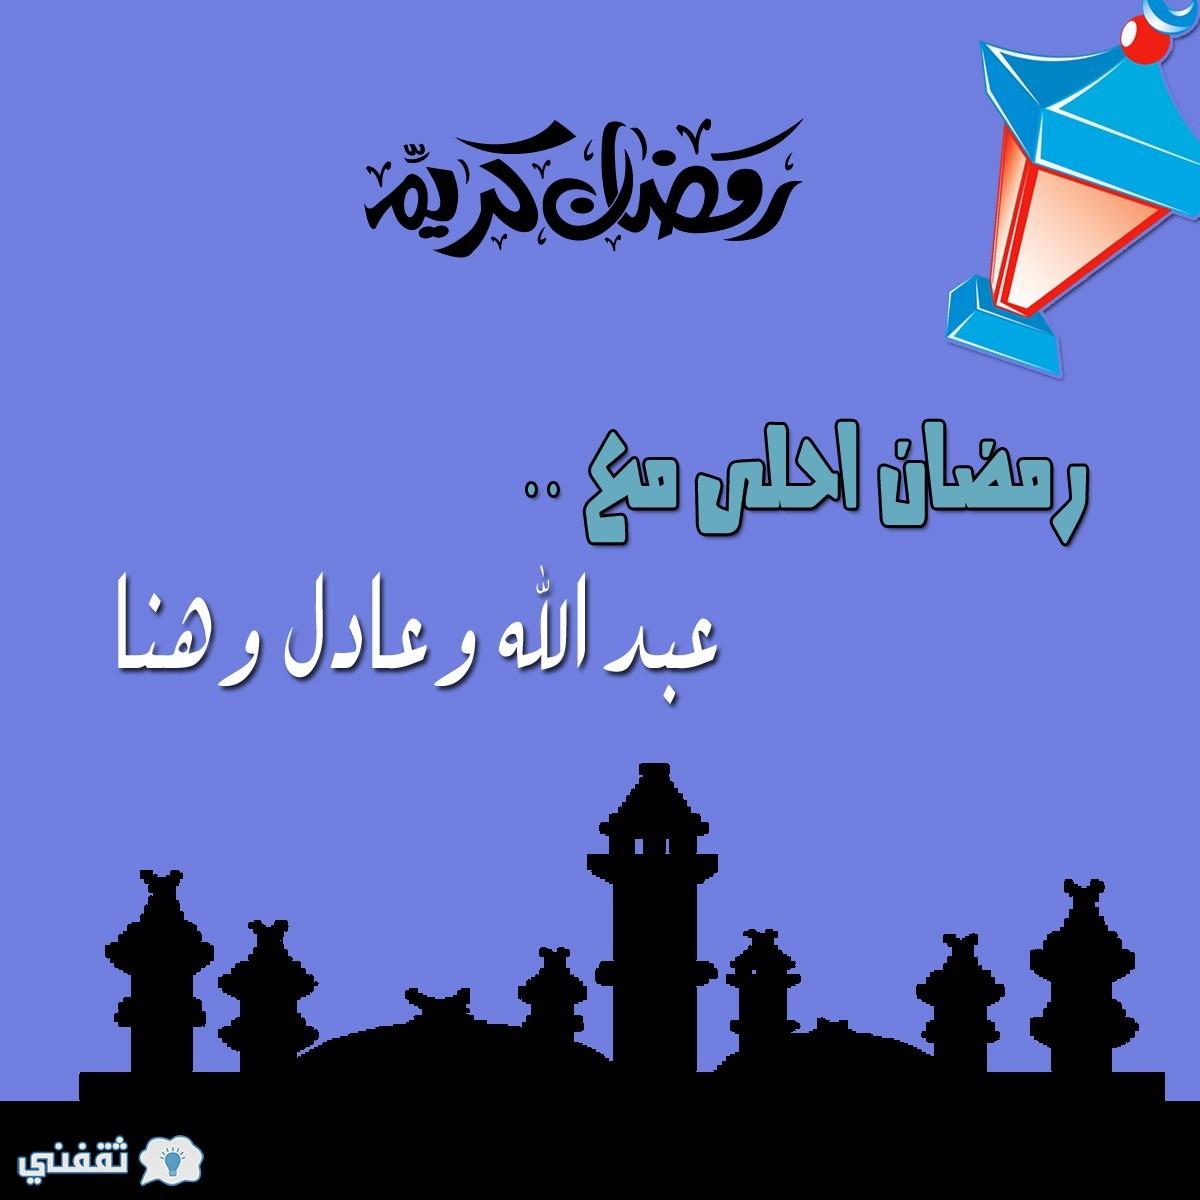 رمضان احلى مع عبدالله و عادل و هنا